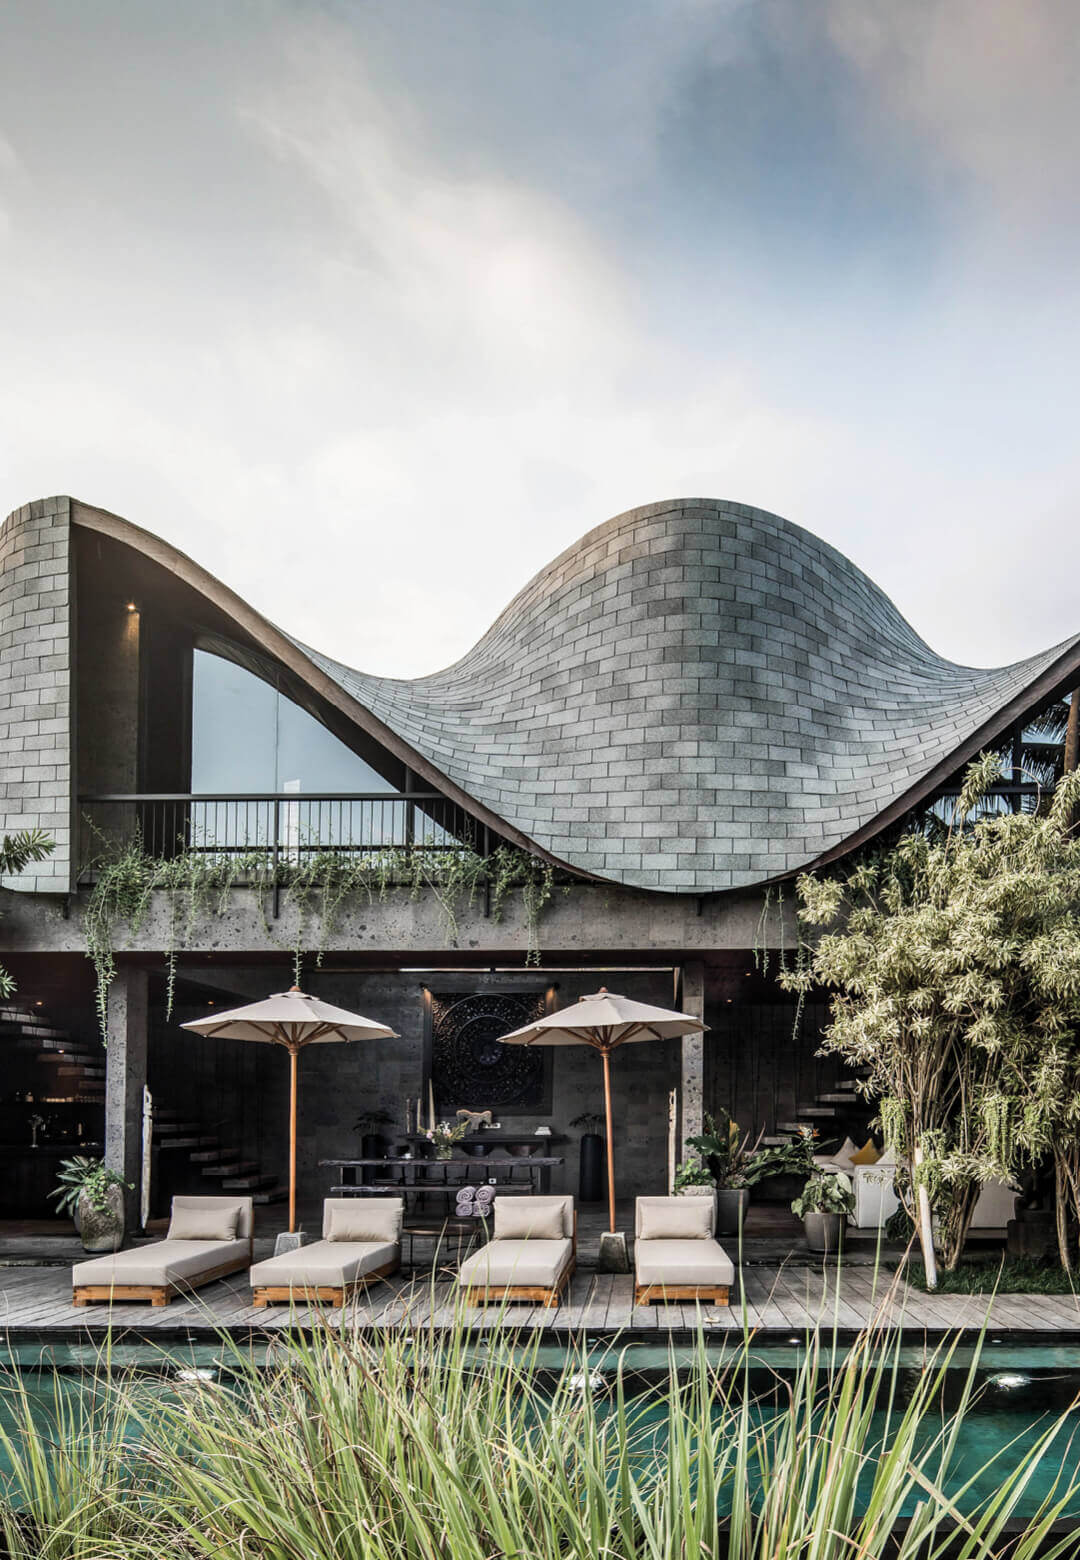 Alpha House by Alexis Dornier features a sinuous grid shell roof | Alpha House by Alexis Dornier | Bali, Indonesia | STIRworld